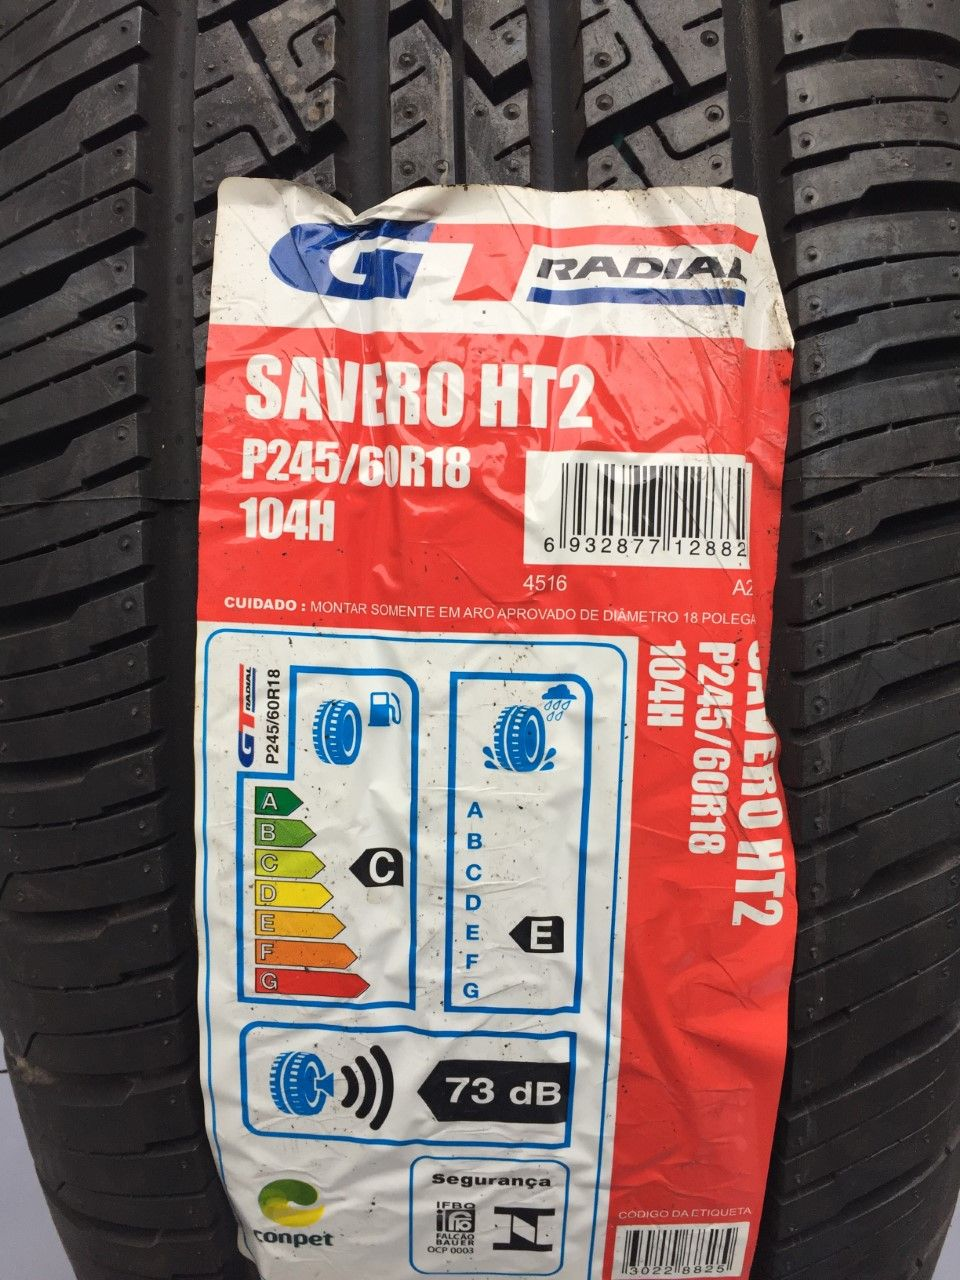 Pneu 245/60R18 GT Radial Champiro Savero HT2 (Hyundai Vera Cruz, Ford Edge)